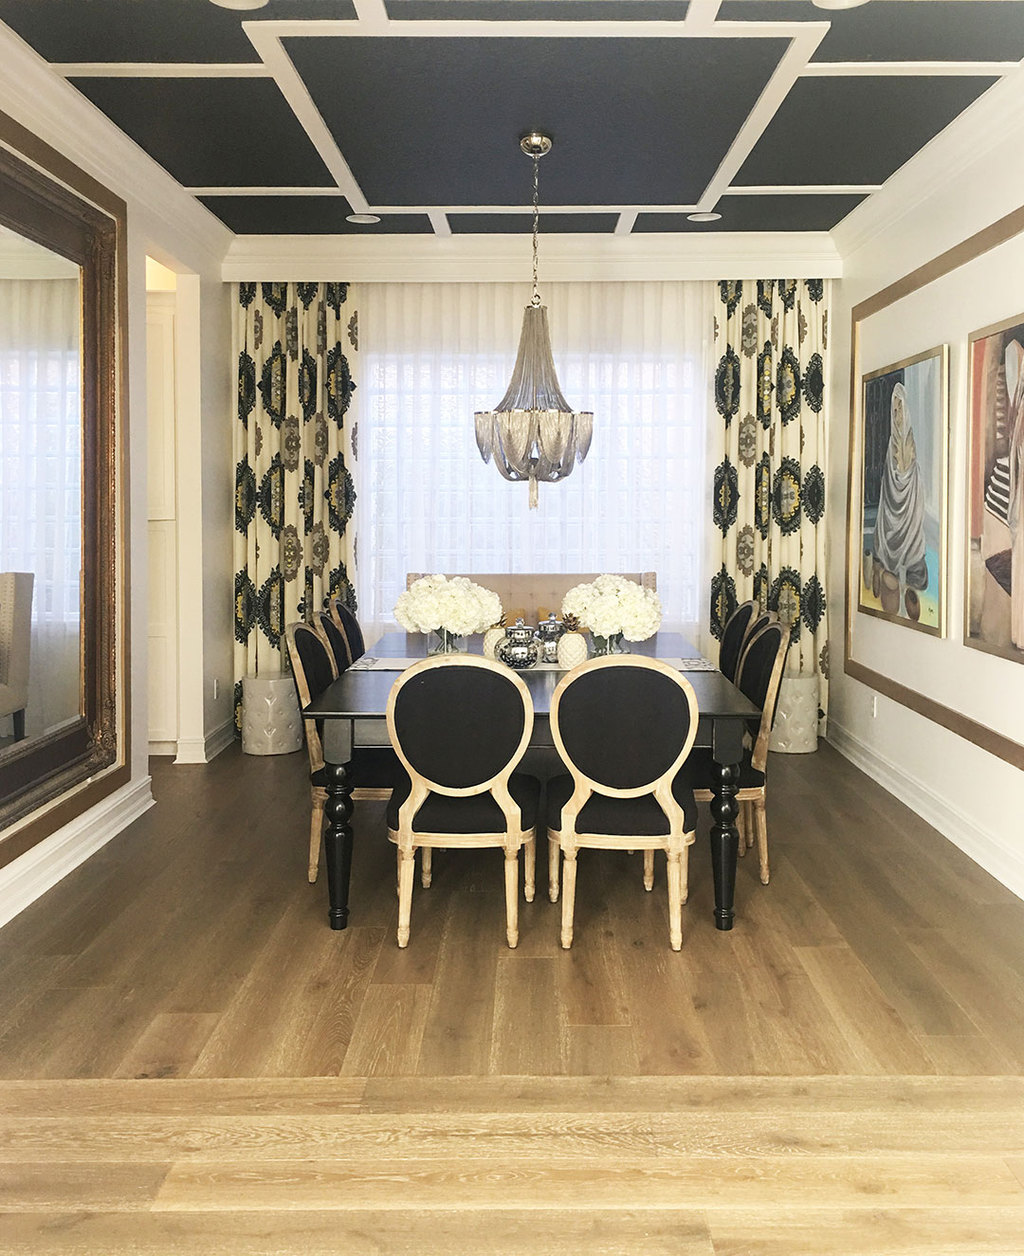 dining-room-black-ceiling-chandelier5